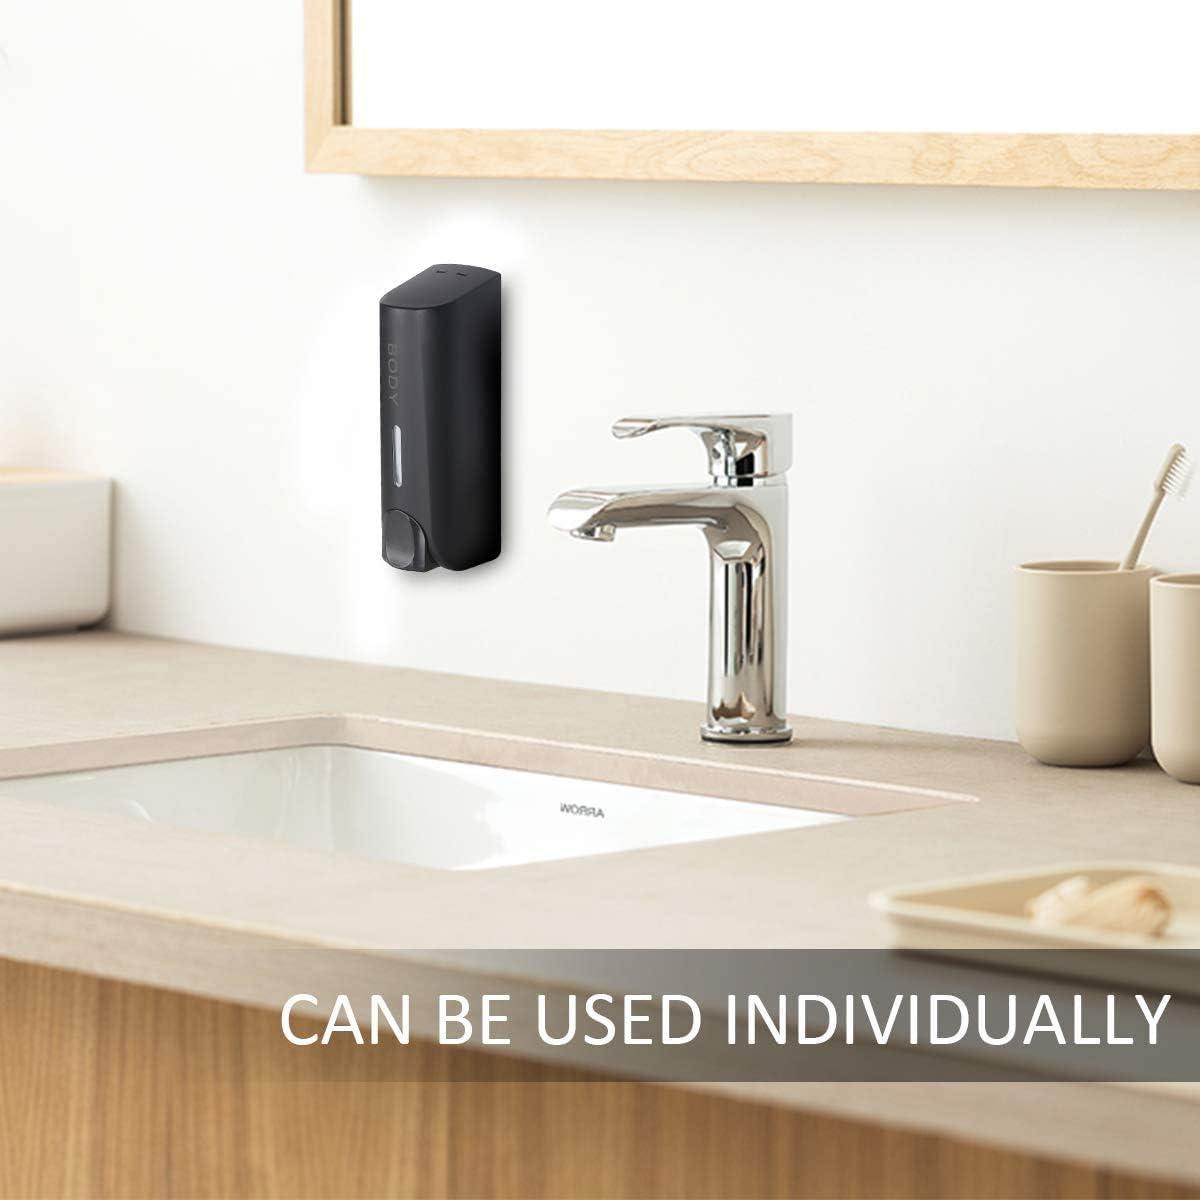 LUOWAN Shower Soap Dispenser ,Shampoo Dispenser,Sanitizer Dispenser Wall Mount Shower Liquid Soap Dispenser 2 Pack Head Shampoo Dispensers for Bathroom Hotel Home Accessories (Black) : Home & Kitchen